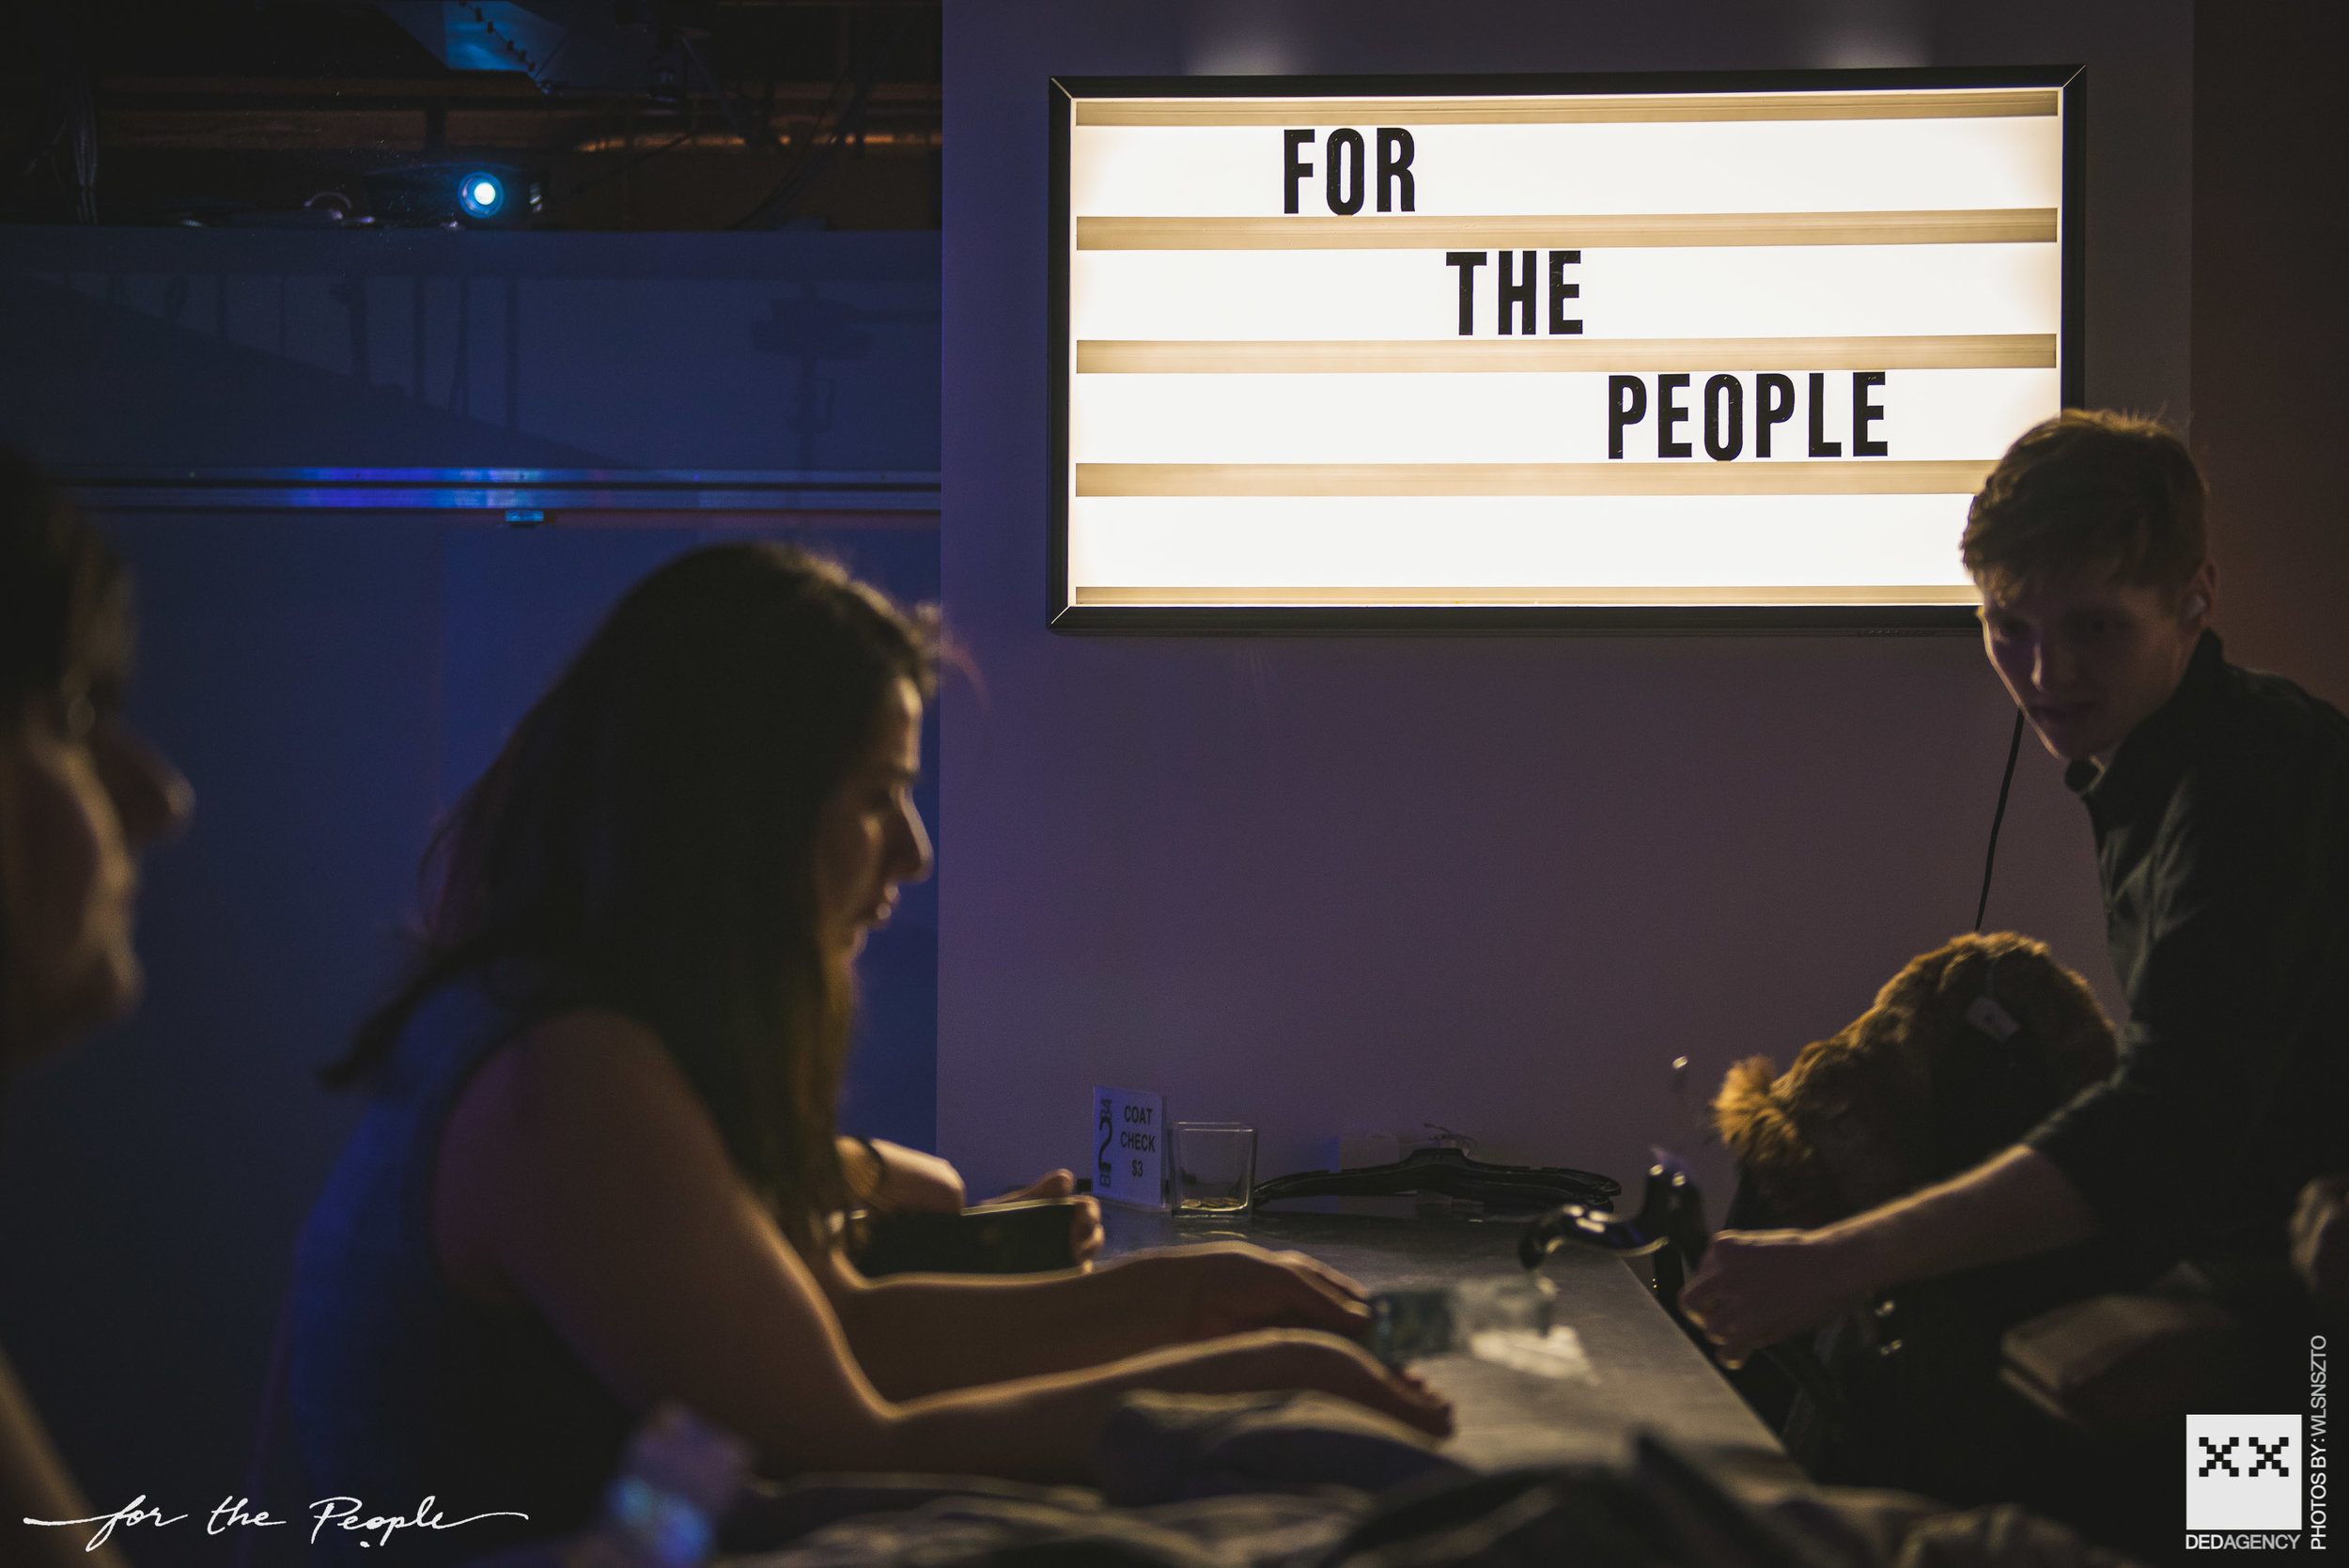 Frivolous - For The People - Feb 25 2017-7508.JPG